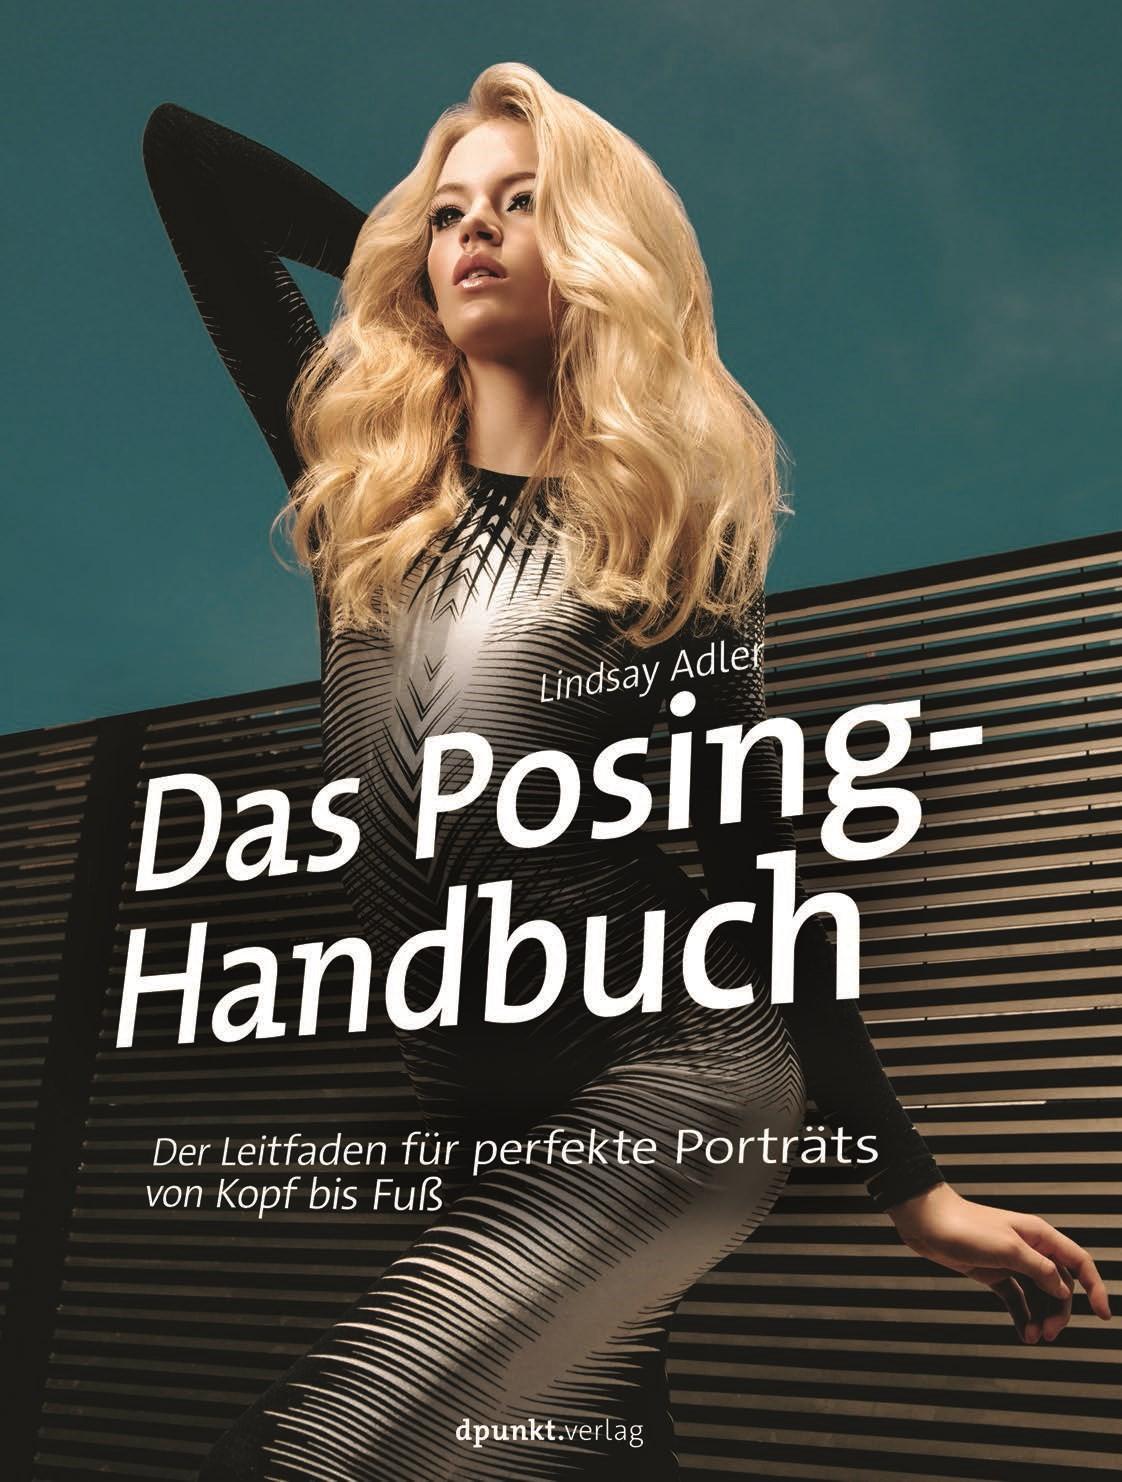 Das Posing-Handbuch | Adler, 2018 | Buch (Cover)